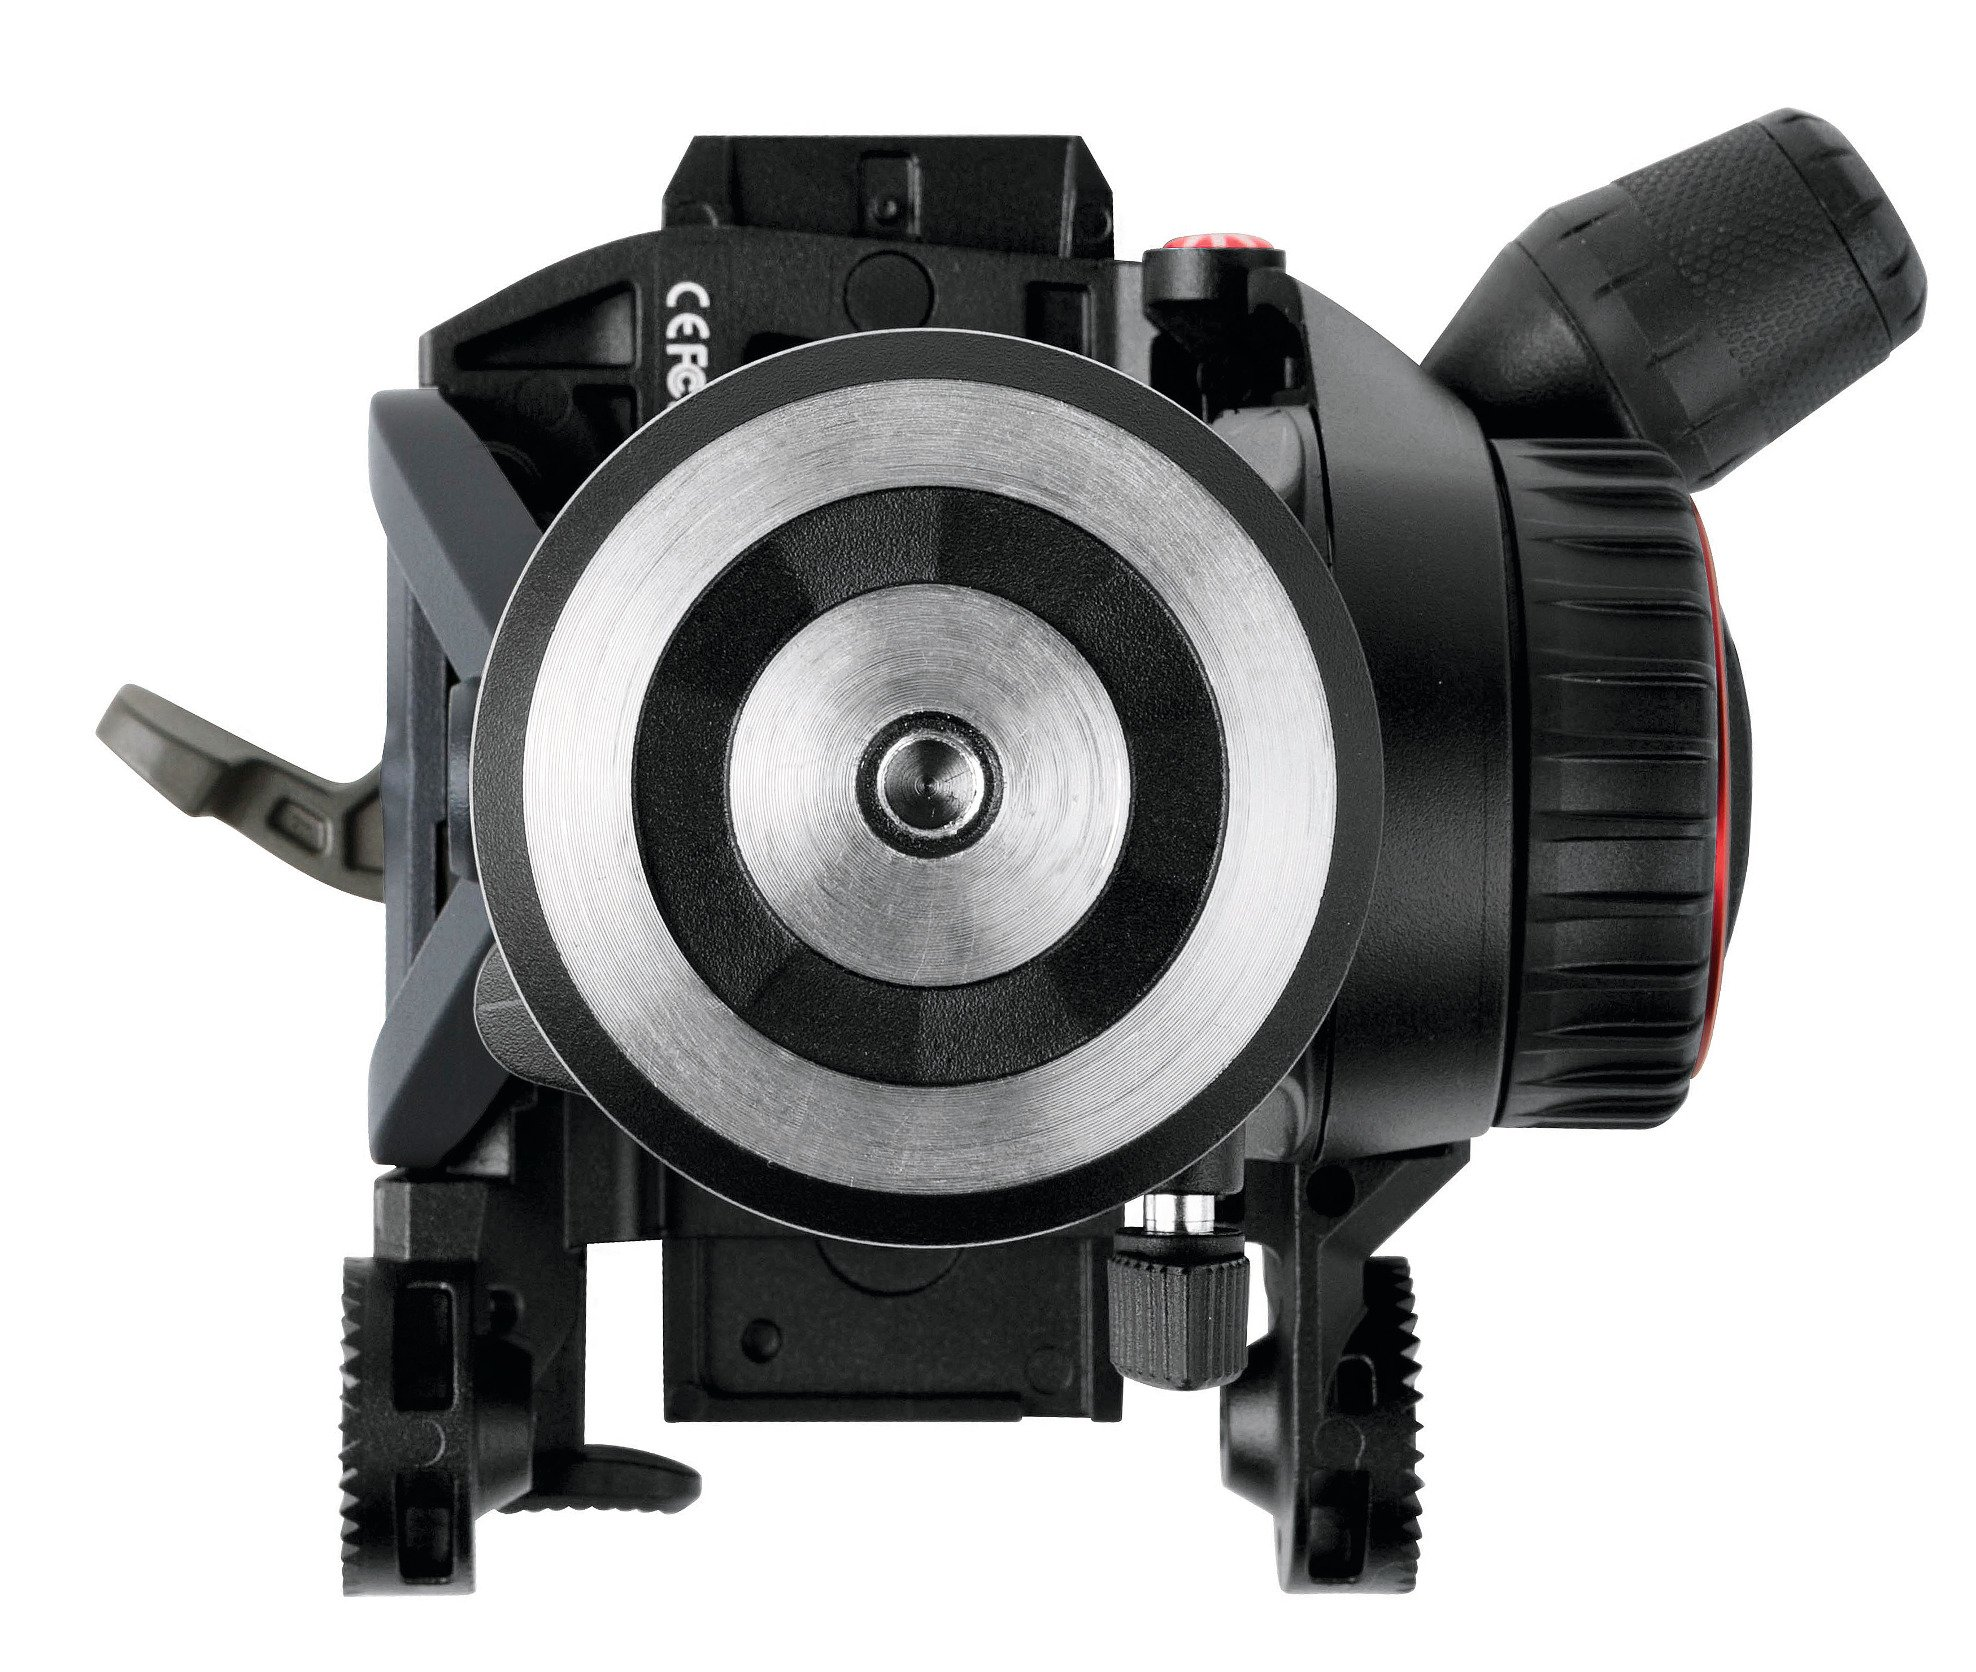 Video Fluid Head and Aluminum Tripod Kit